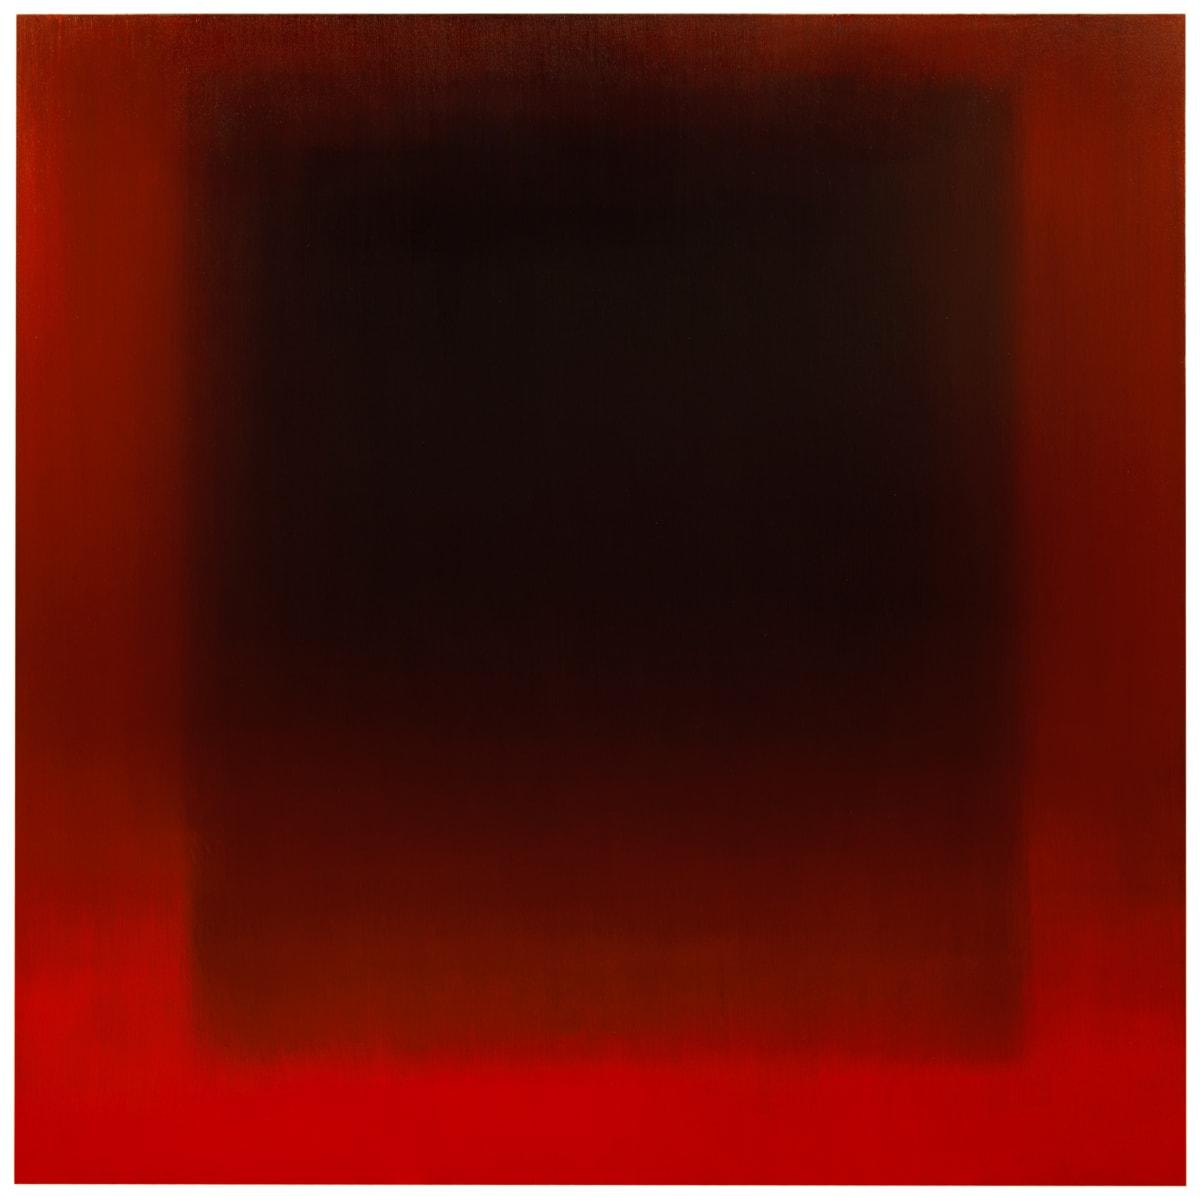 Sergio Lucena, Pintura No. 18, 2011